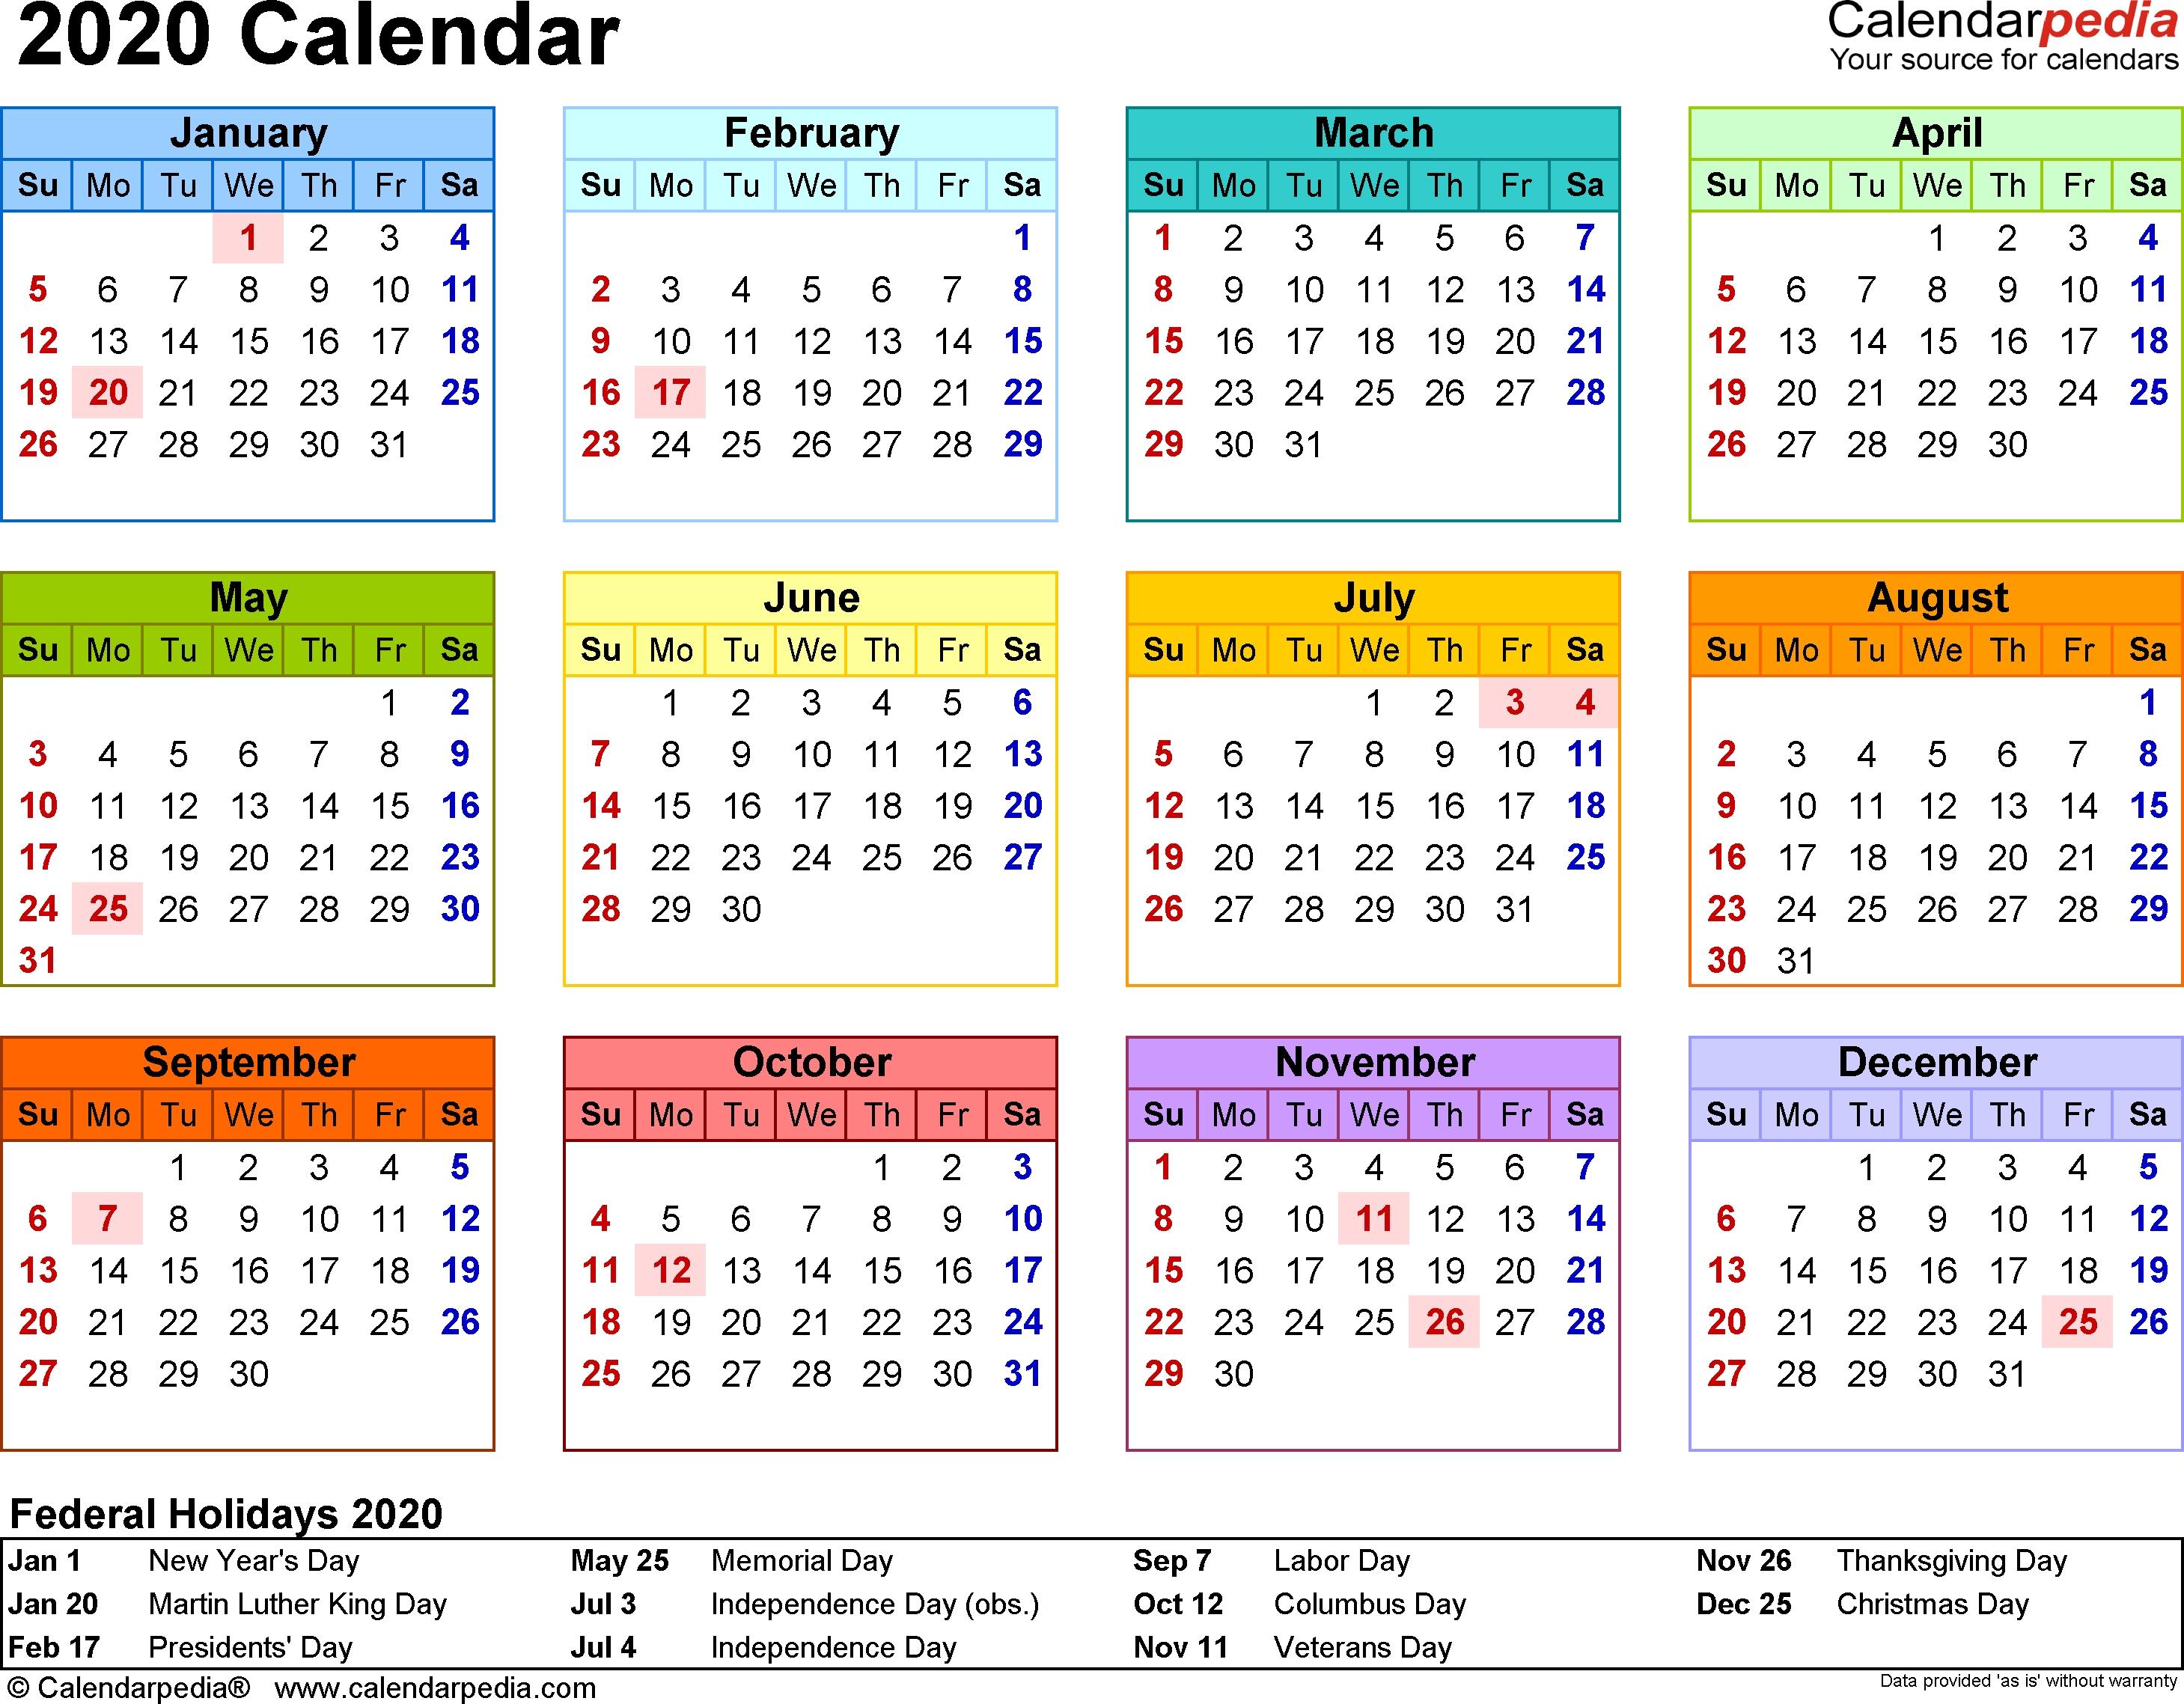 2020 Calendar - 17 Free Printable Word Calendar Templates inside 2020 Free Printable Emploee Calendars